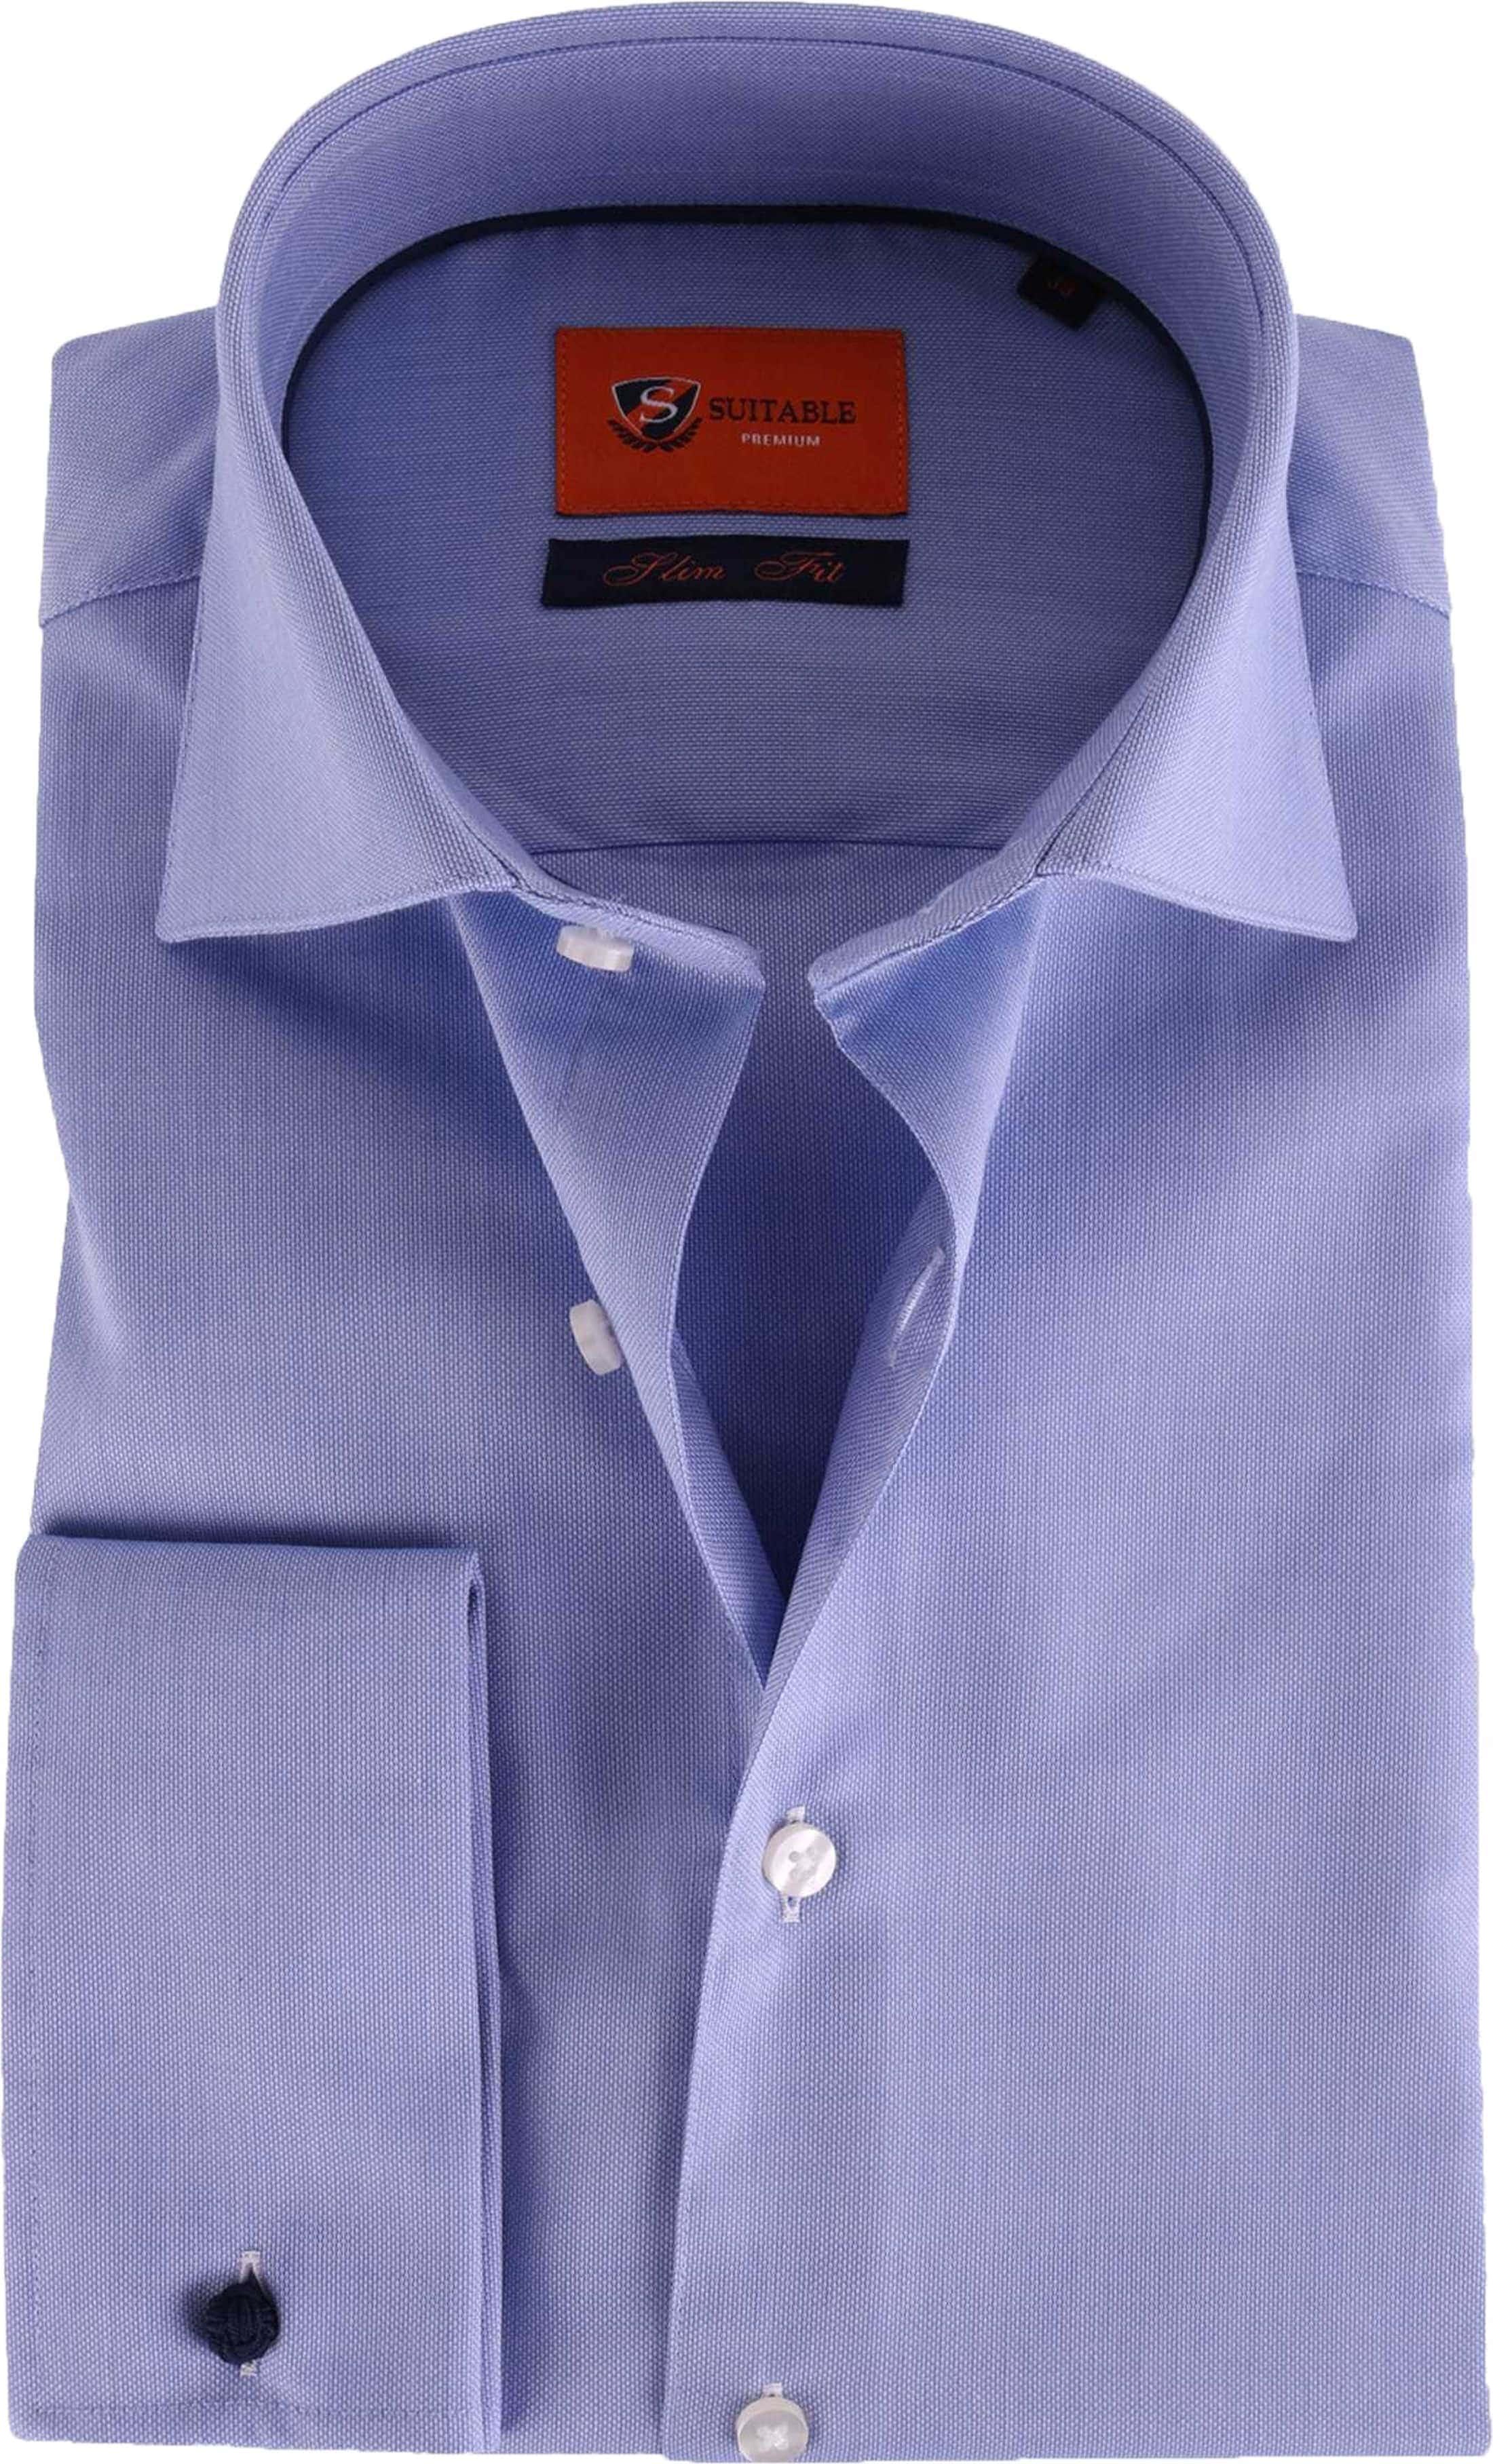 Overhemd Blauw.Dubbelmanchet Overhemd Blauw 52 21 52 21 Easycare Dc Sf Blstr